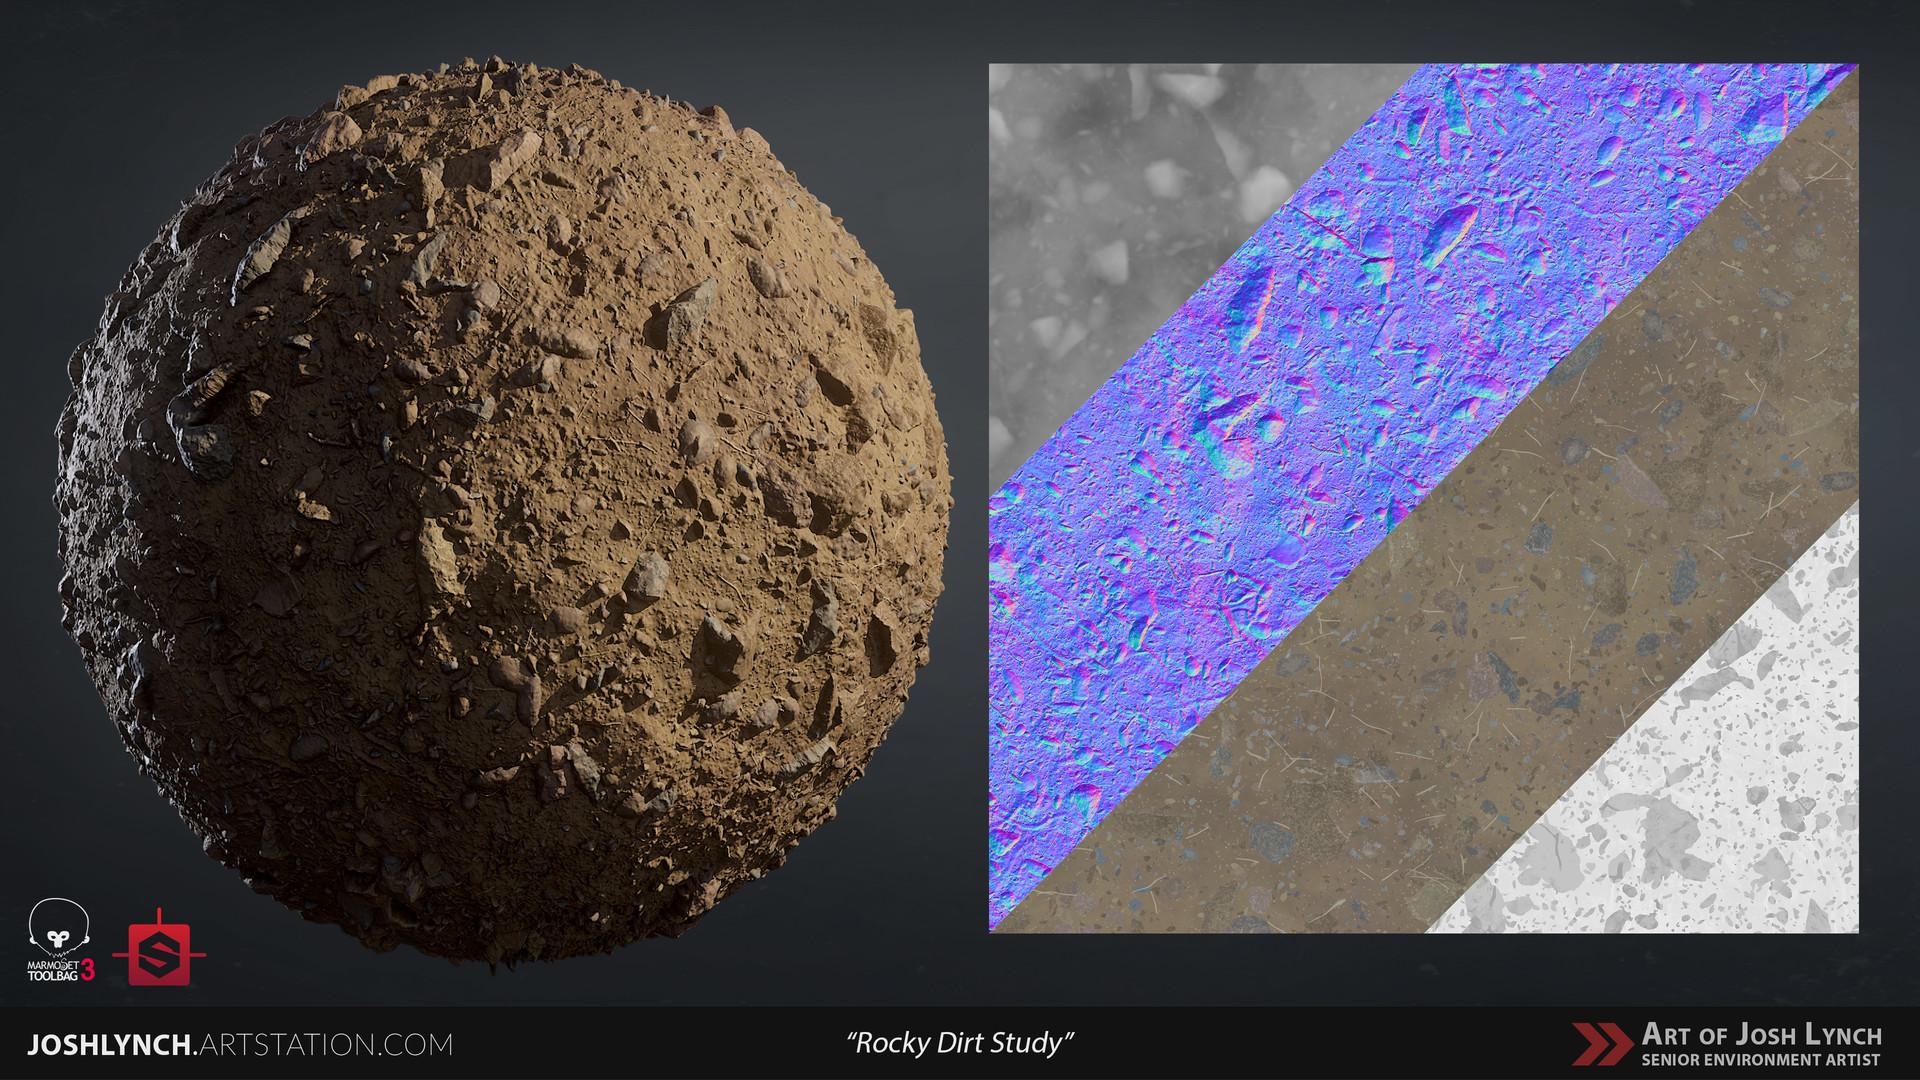 Joshua lynch ground dirt 02 02 sphere comp